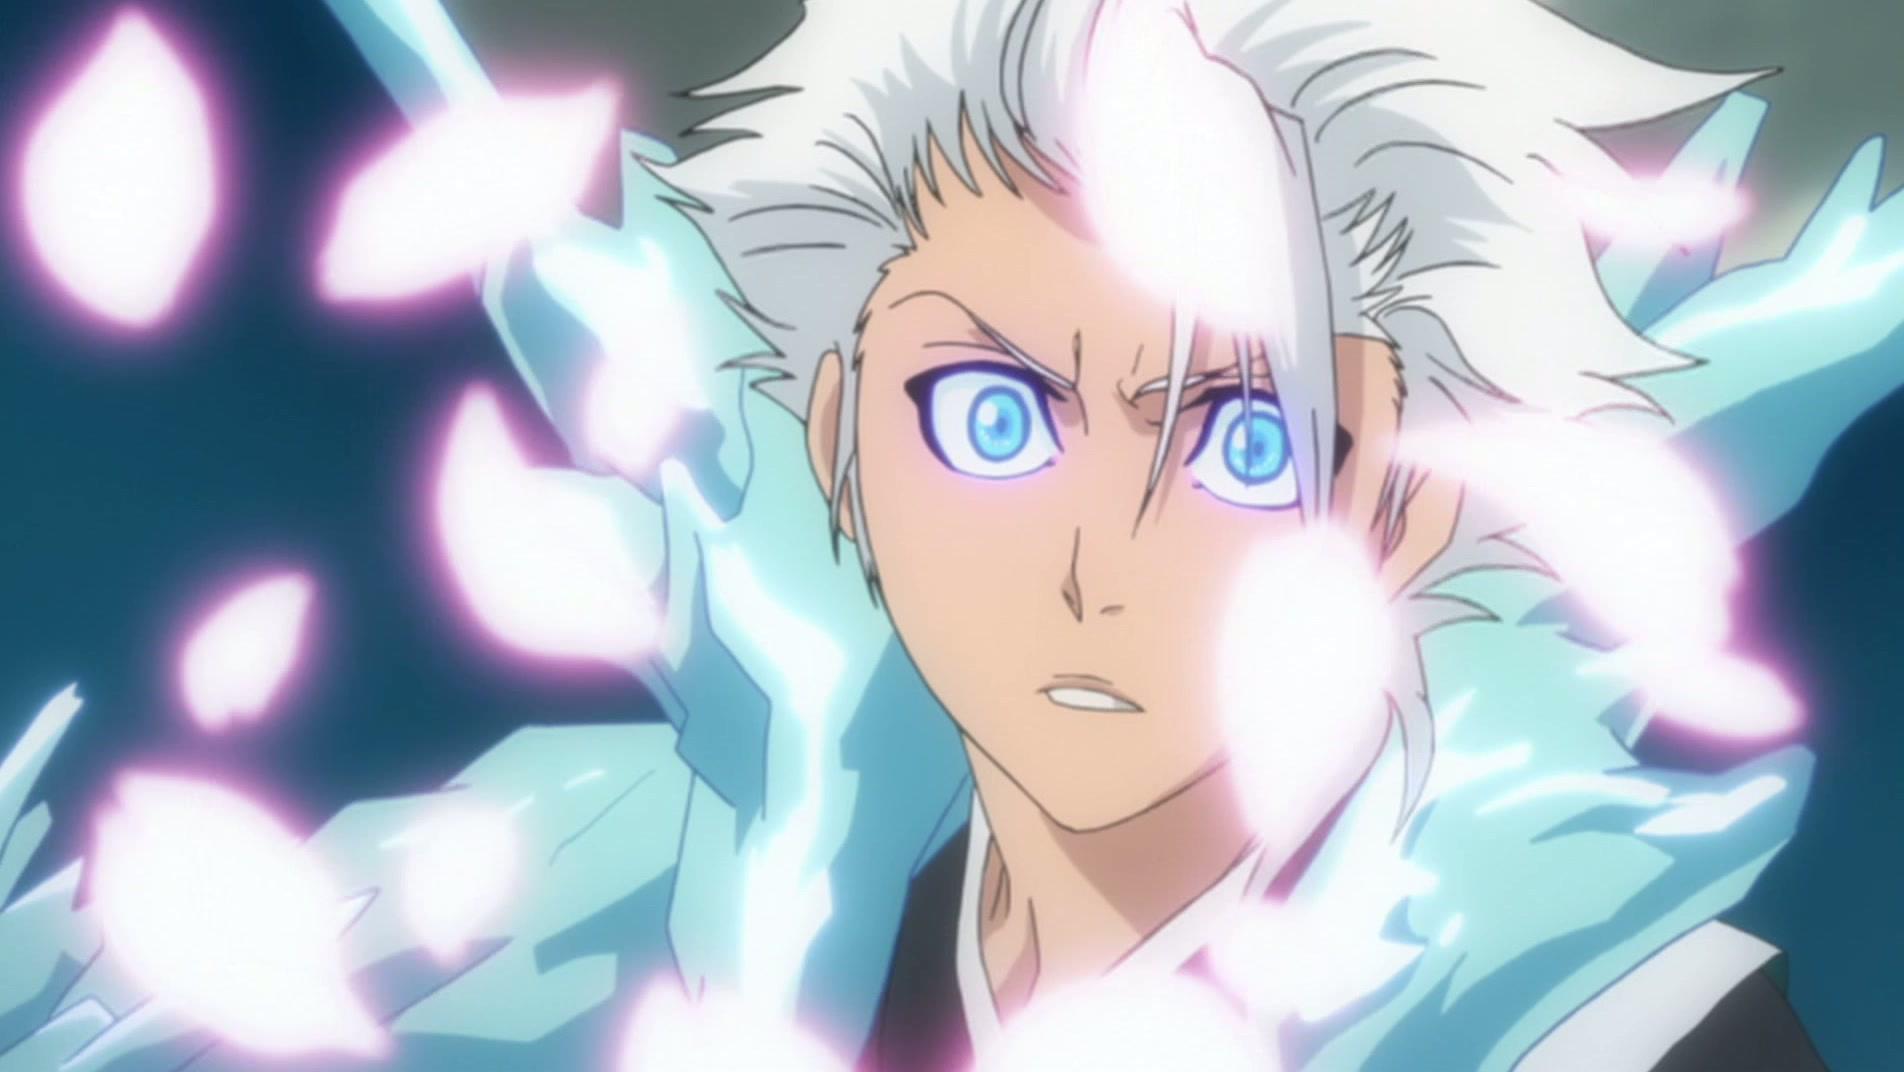 Watch Naruto Shippuden Episode 325 English Dubbed - ▷ ▷ PowerMall